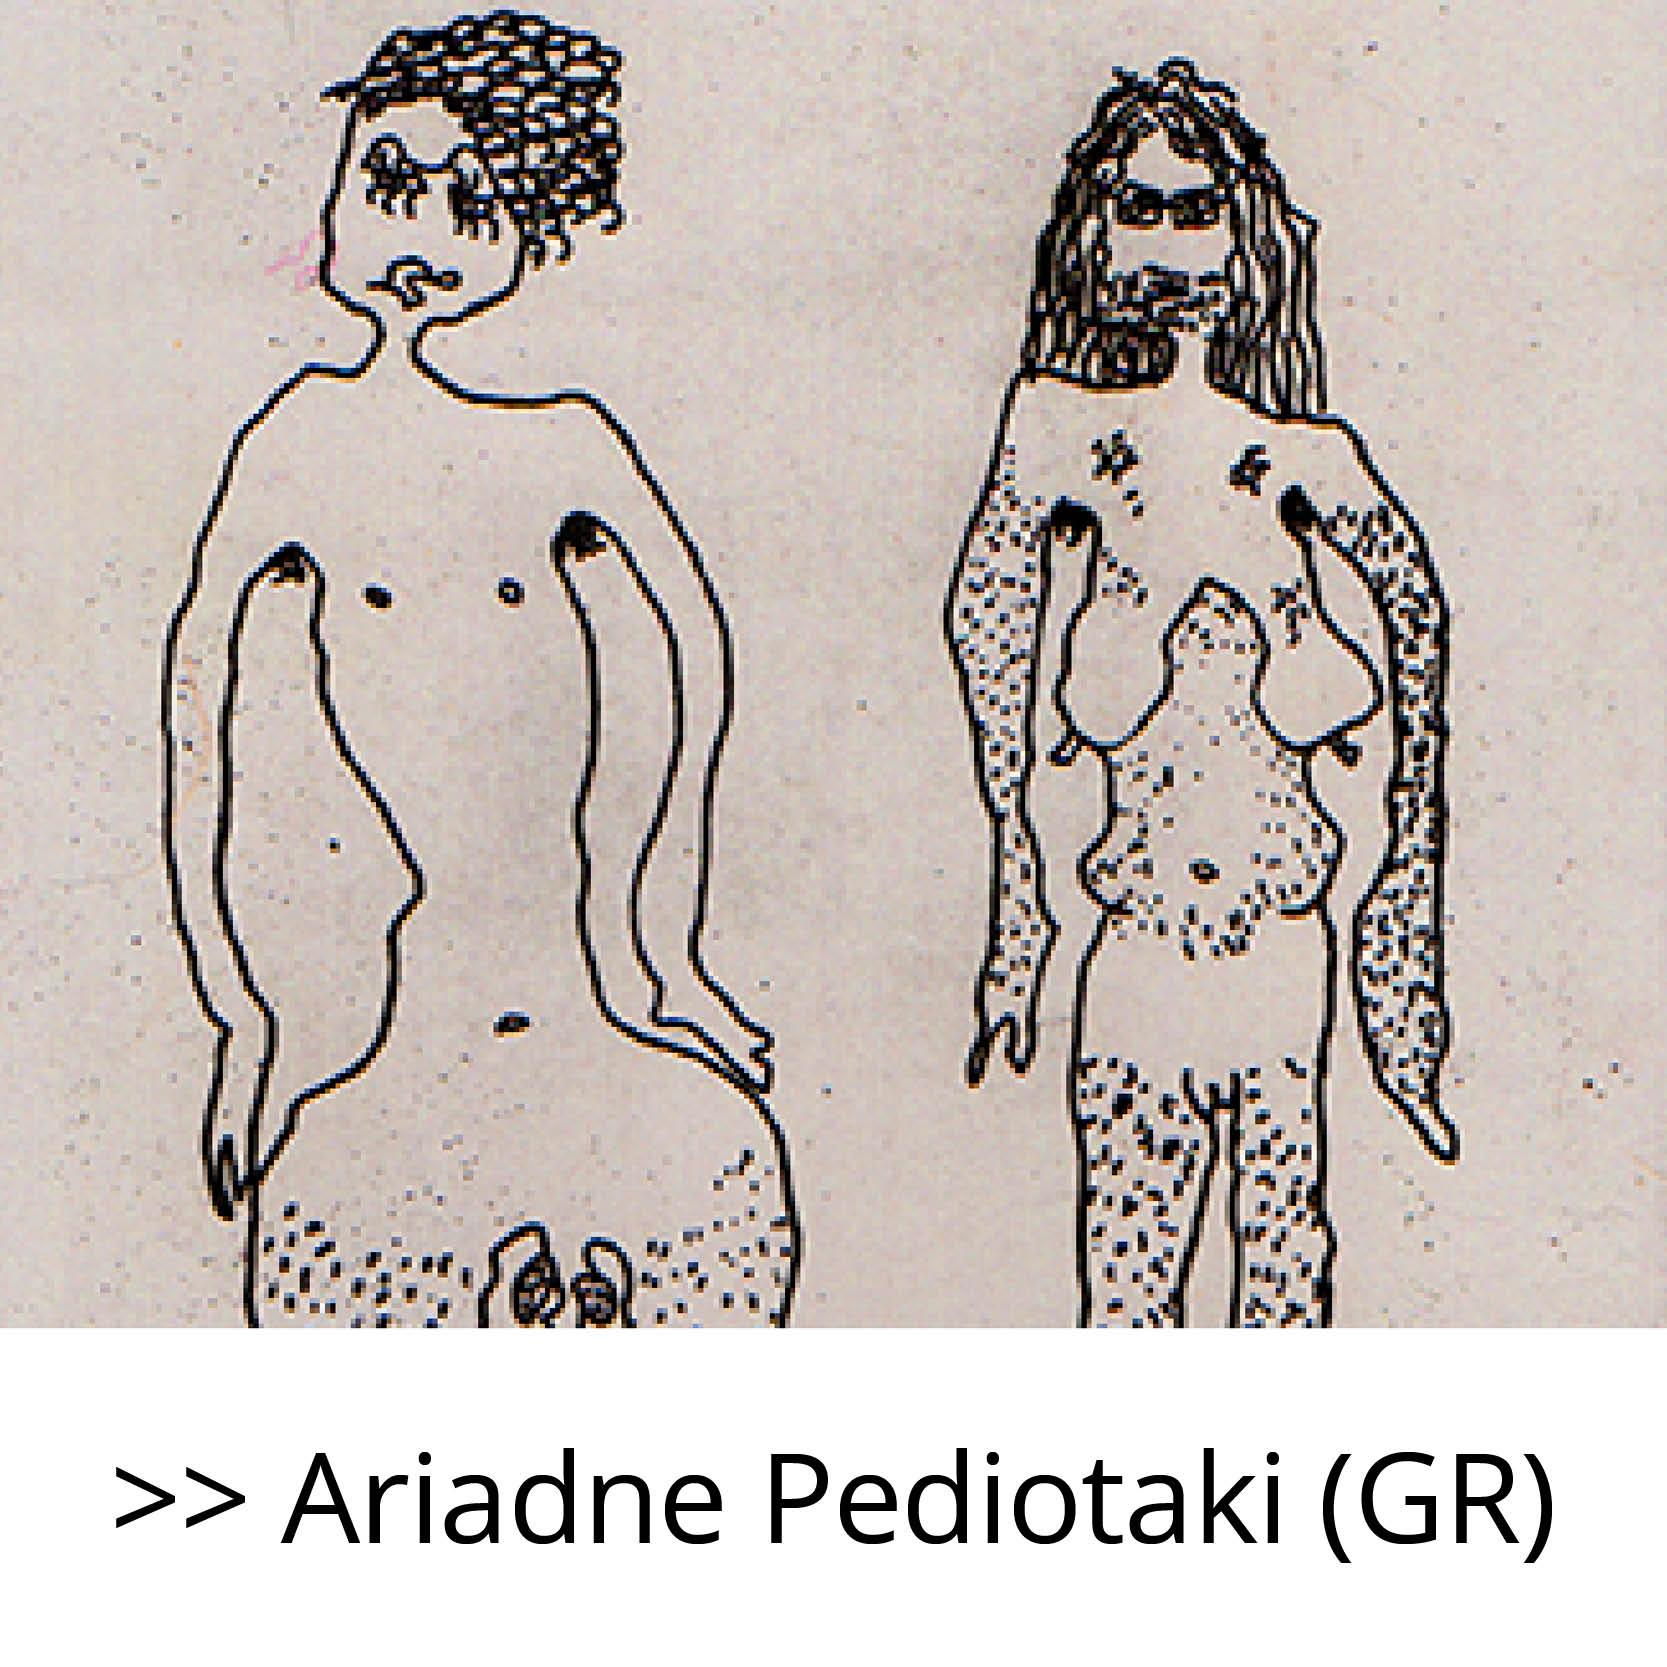 Ariadne_Pediotaki_(GR)